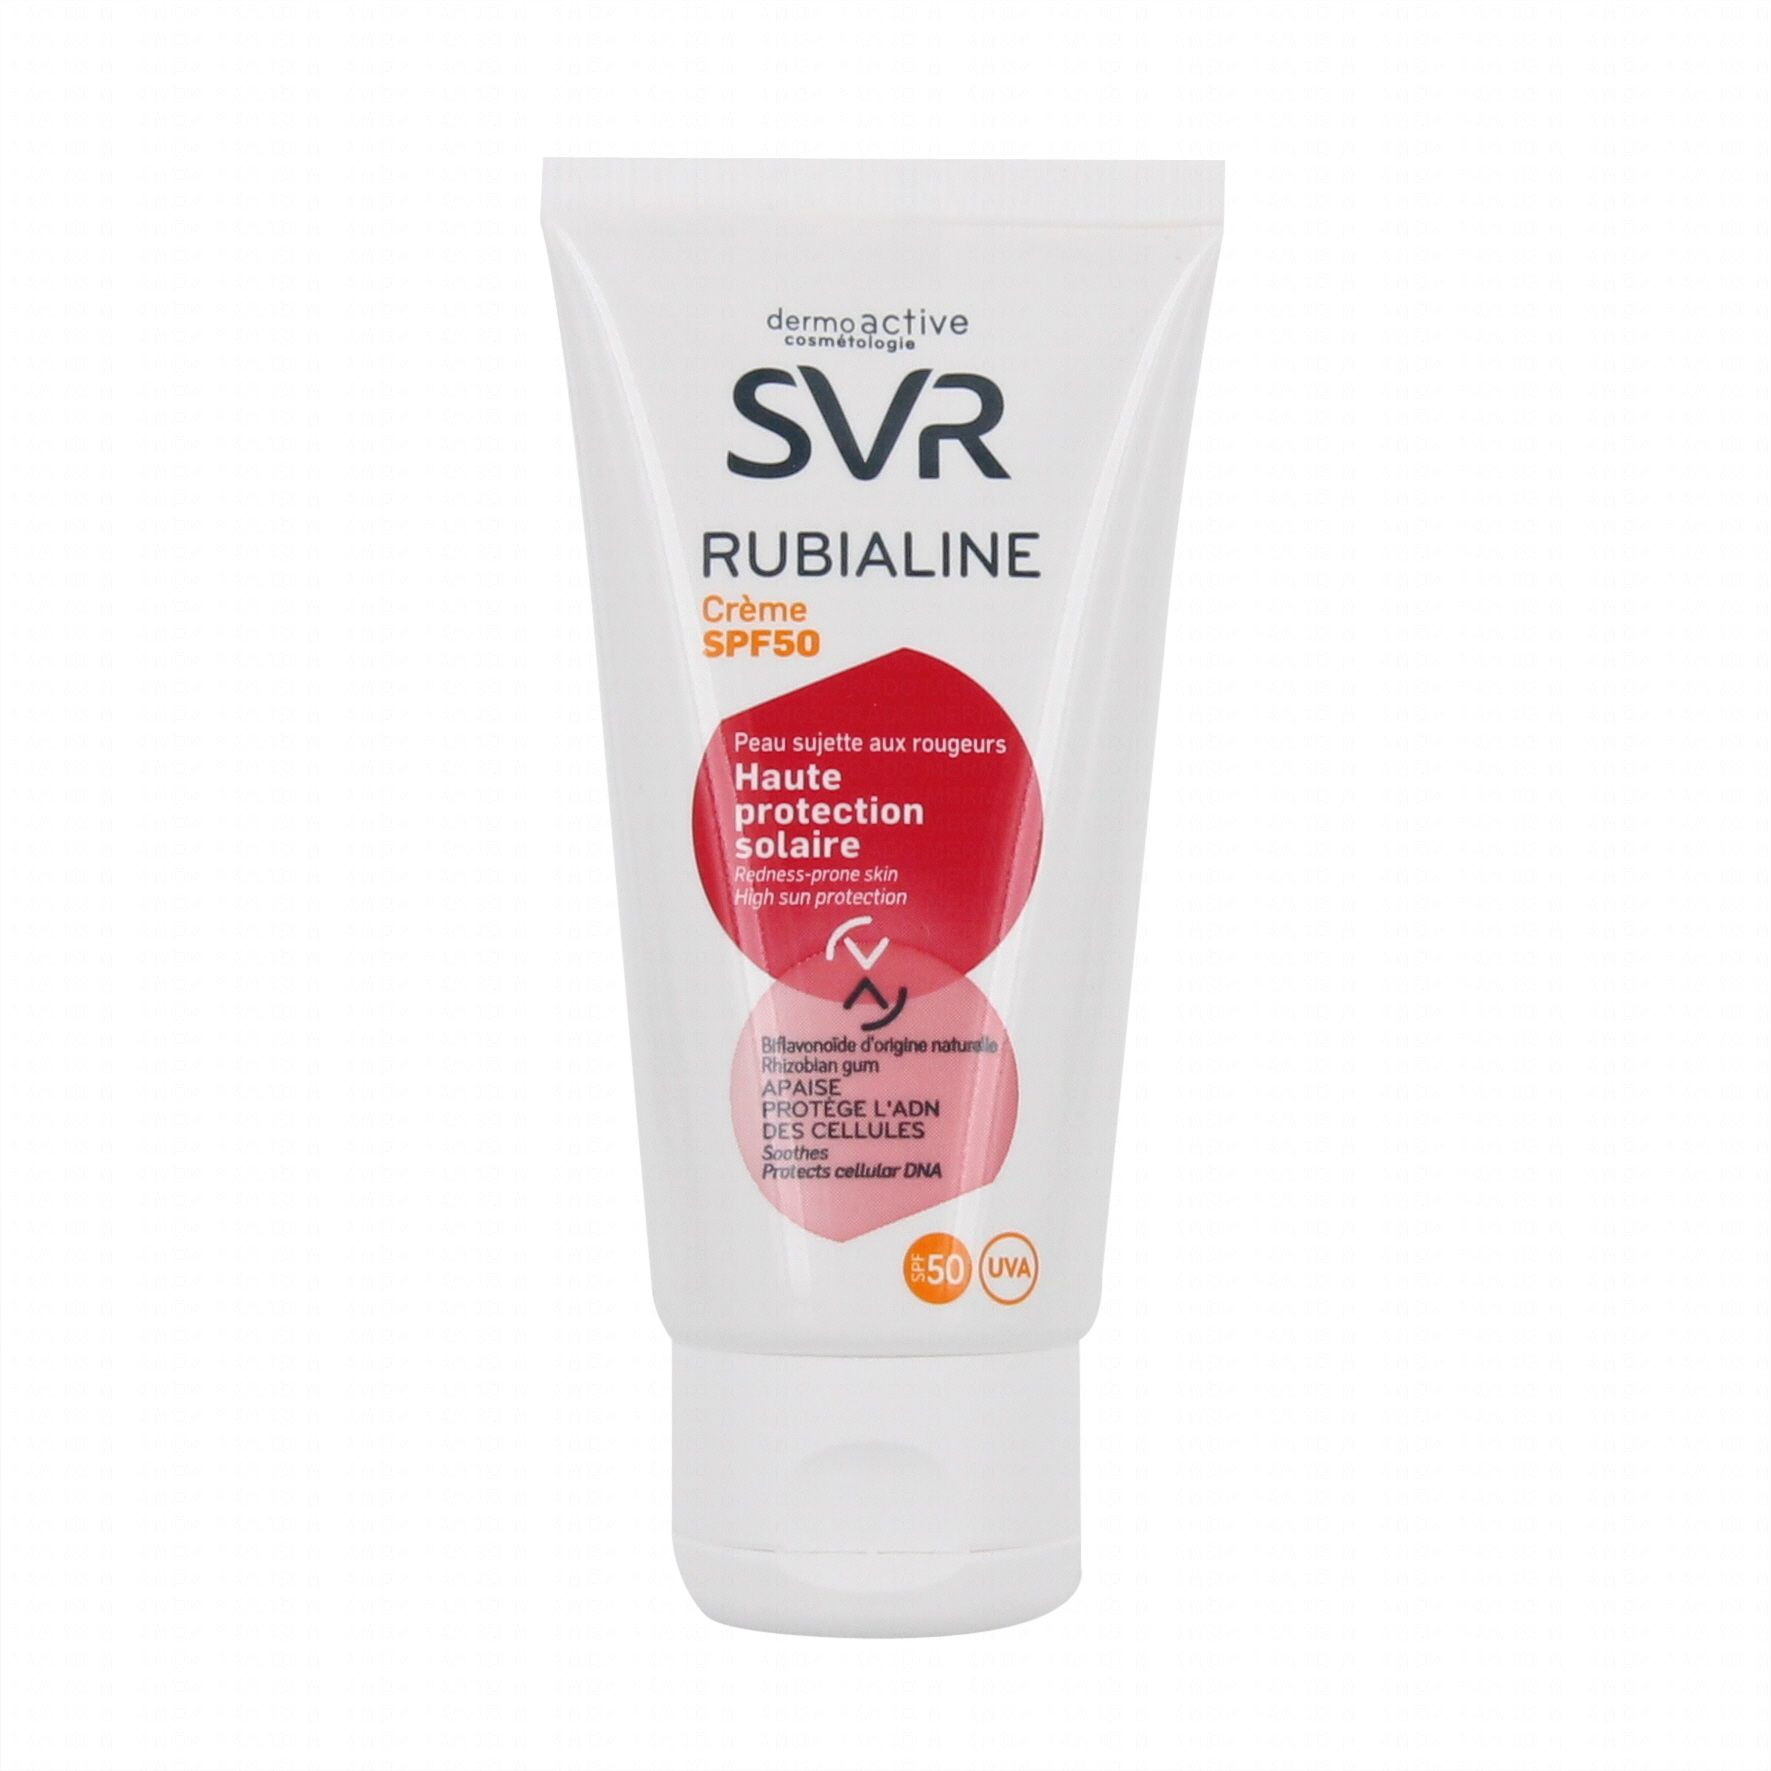 Rubialine Rubialine Crème SPF 50 (50 ml) NOUVEAU